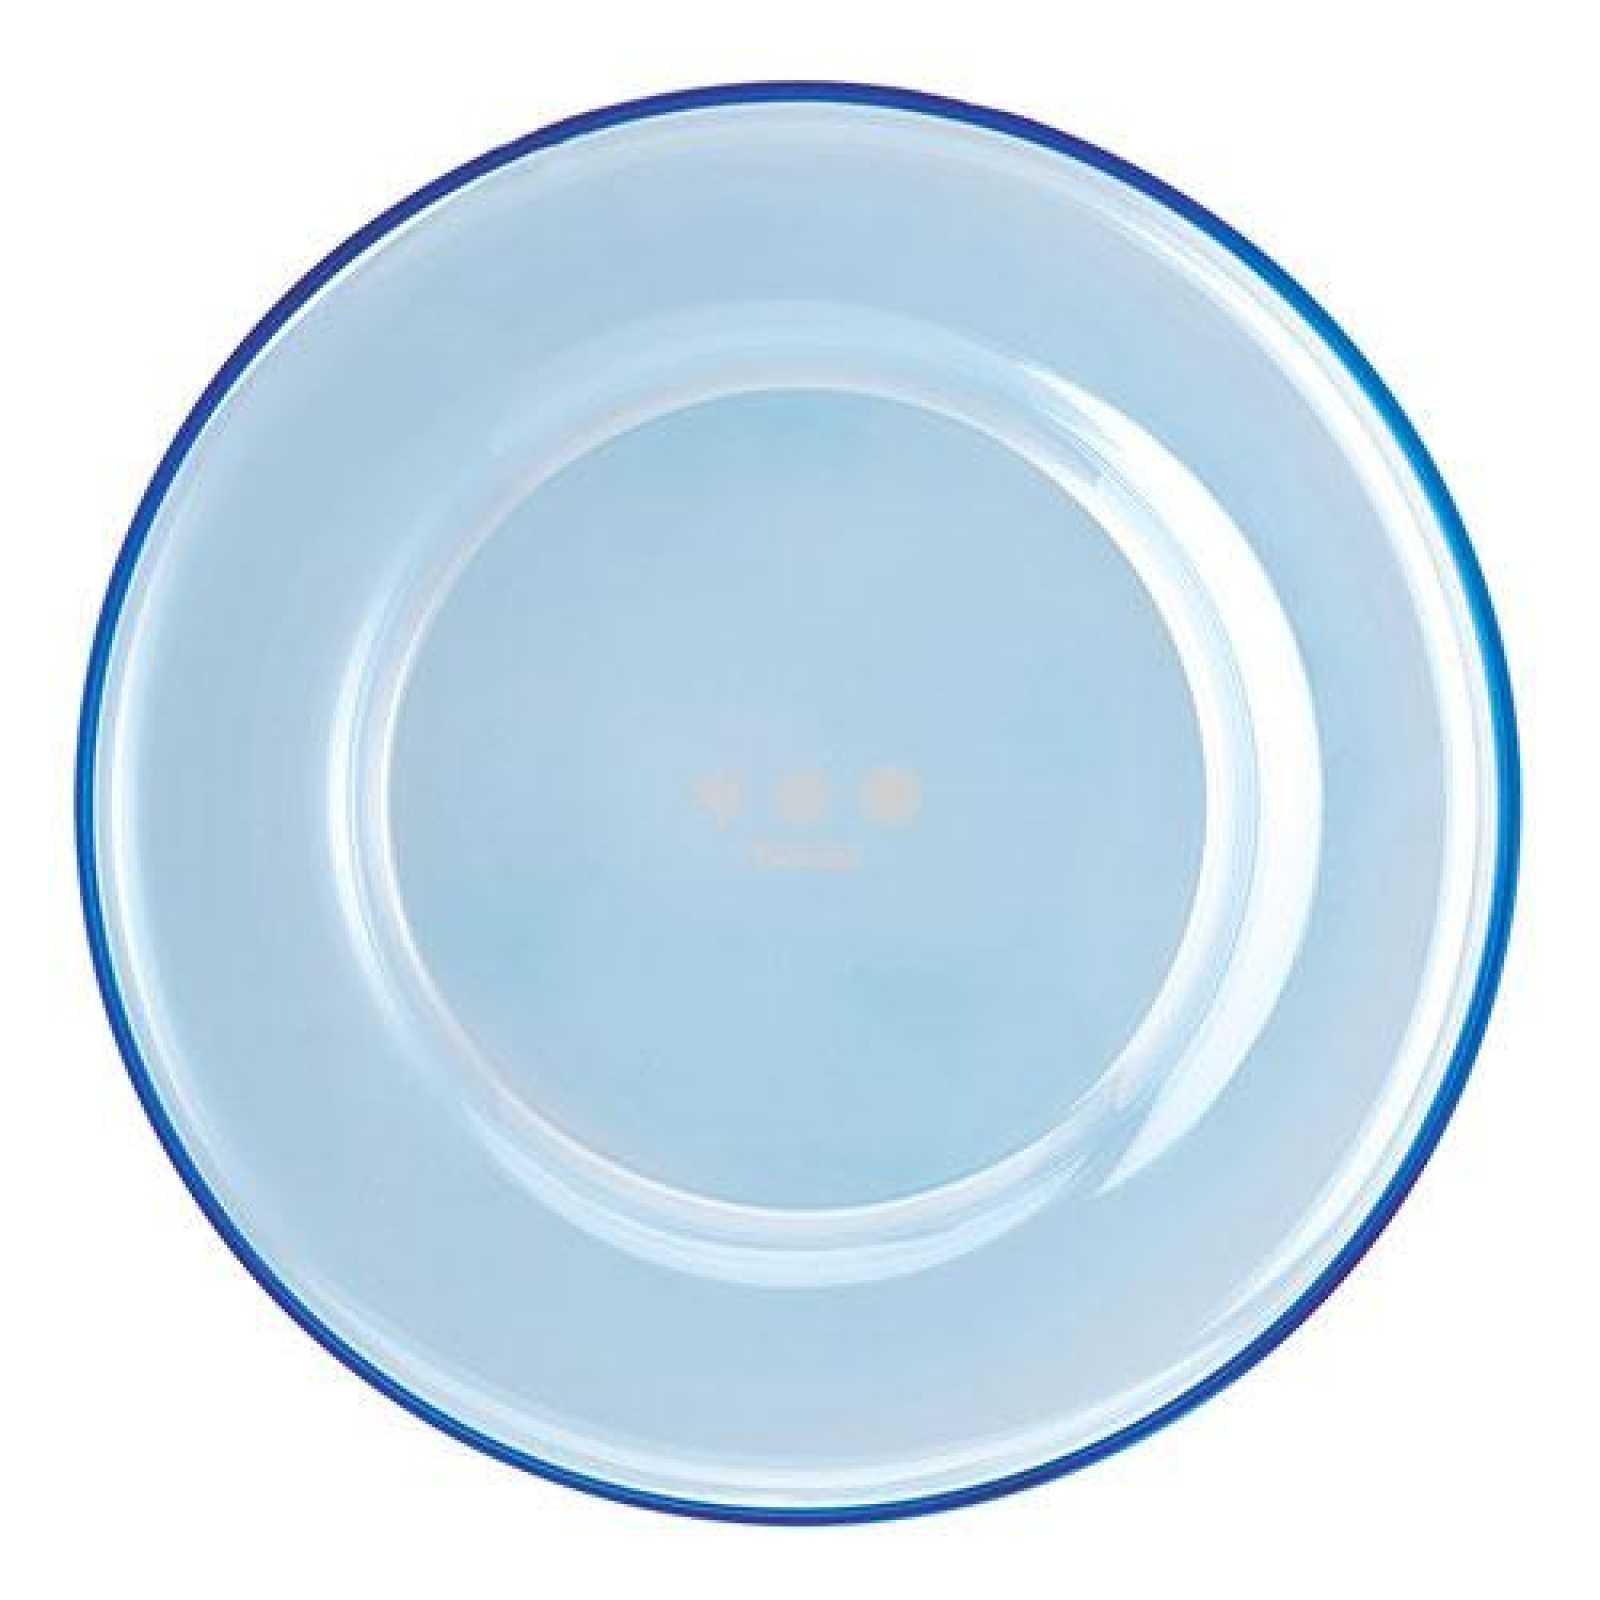 Онлайн каталог PROMENU: Блюдо стеклянное Rosenthal SUNNY DAY, диаметр 27 см, голубой Rosenthal 69034-408530-45027